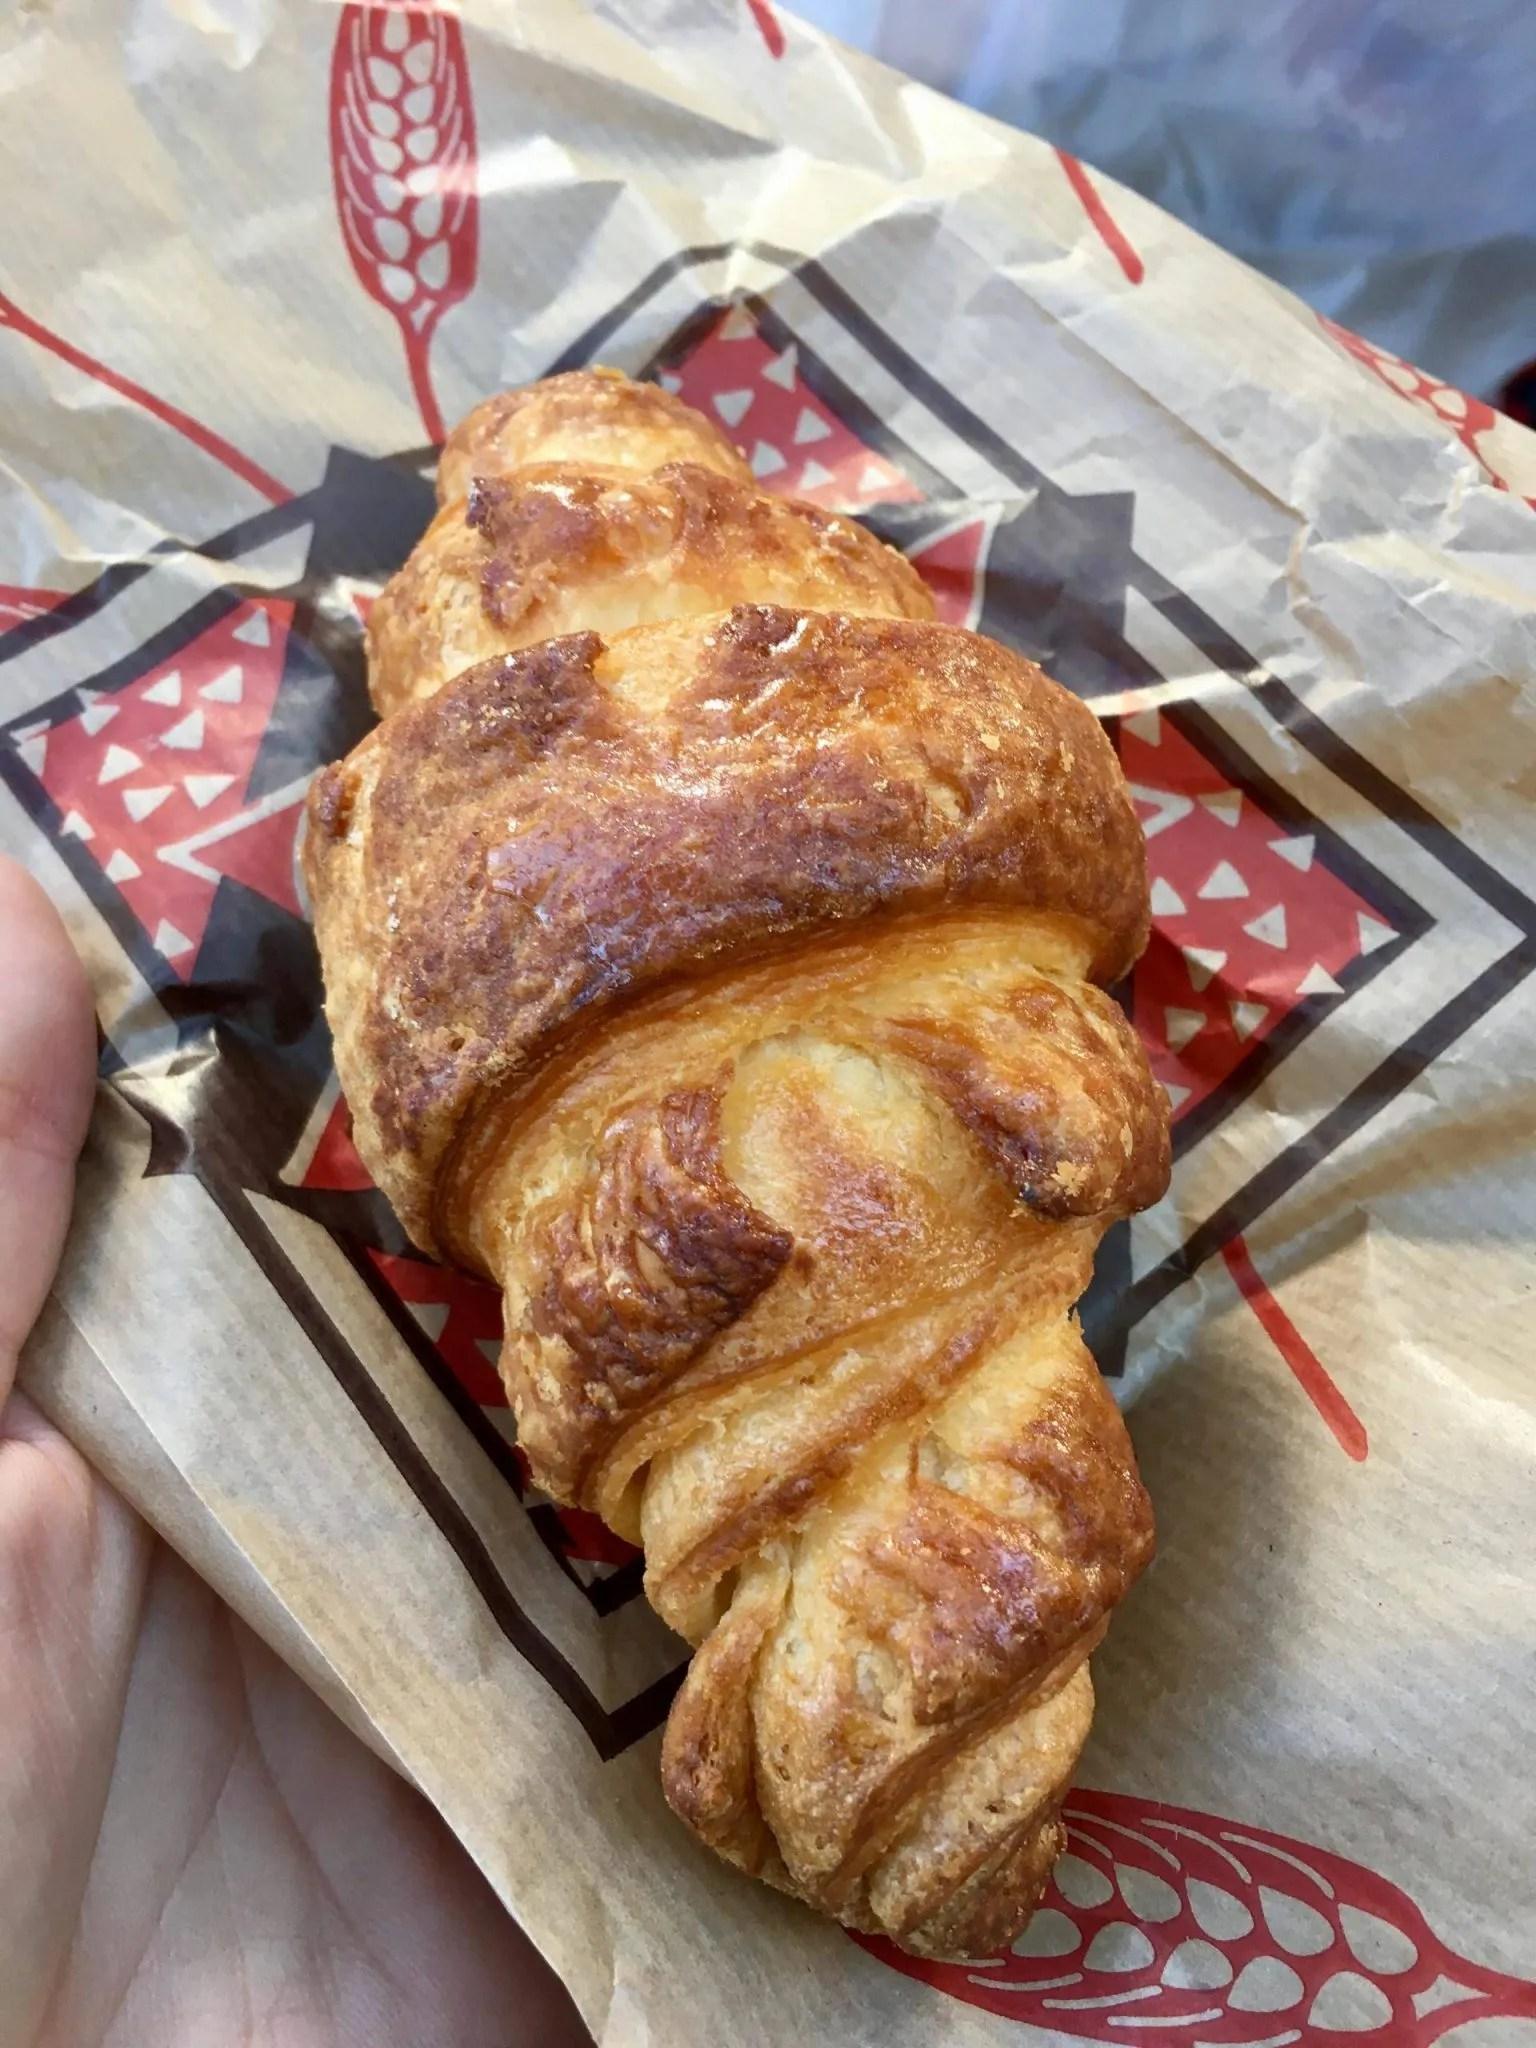 adventures of a gluten free globetrekker Gluten Free Madrid: Sana Locura Bakery & Other Gluten Free Tips Madrid Spain